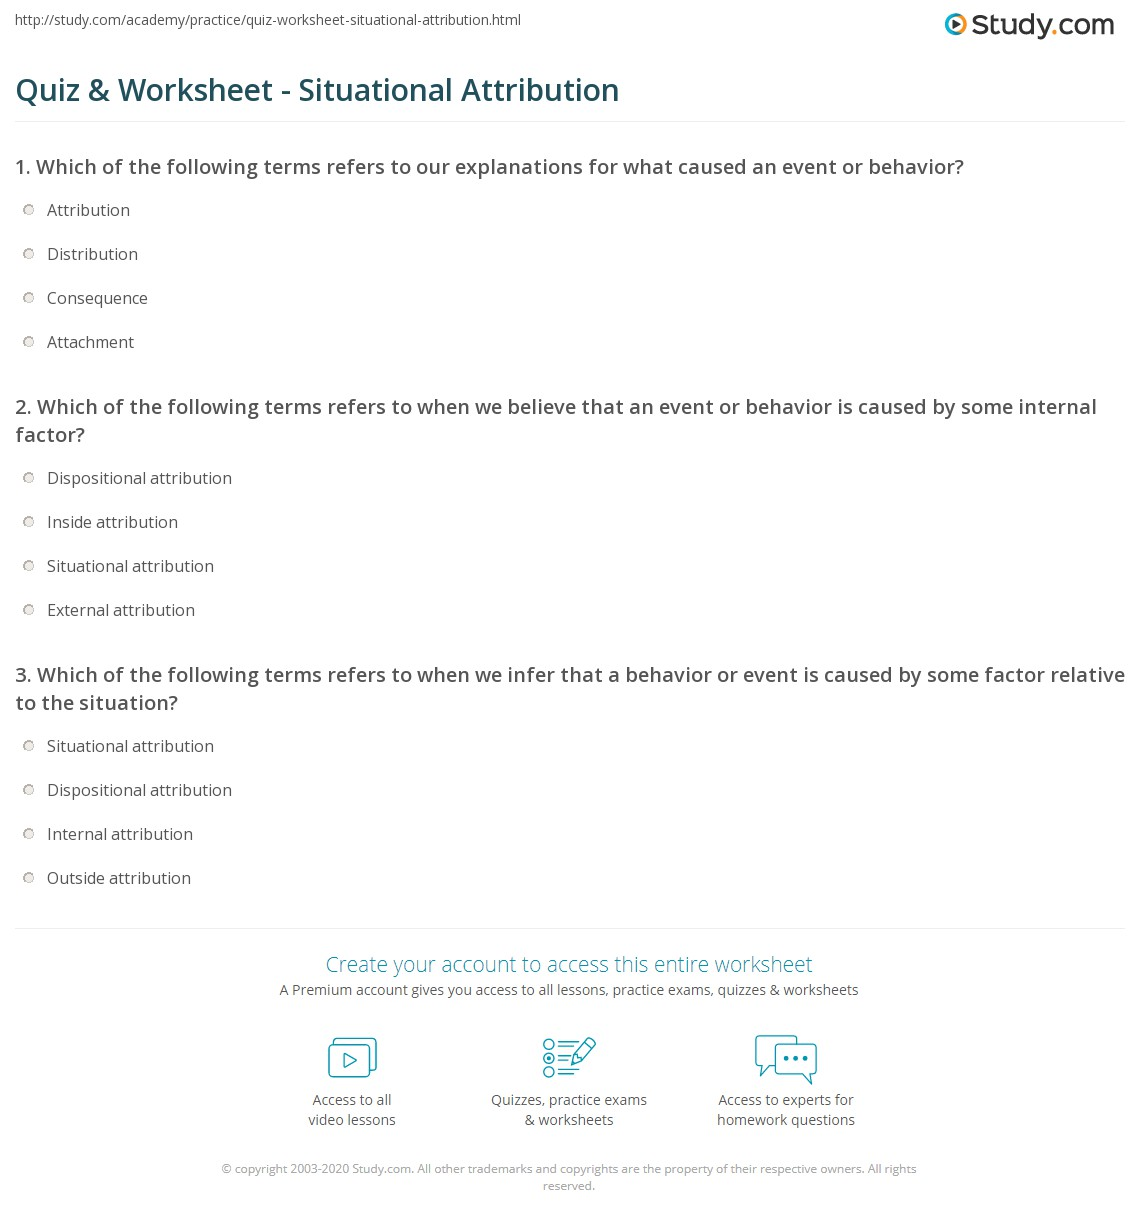 quiz worksheet situational attribution study com